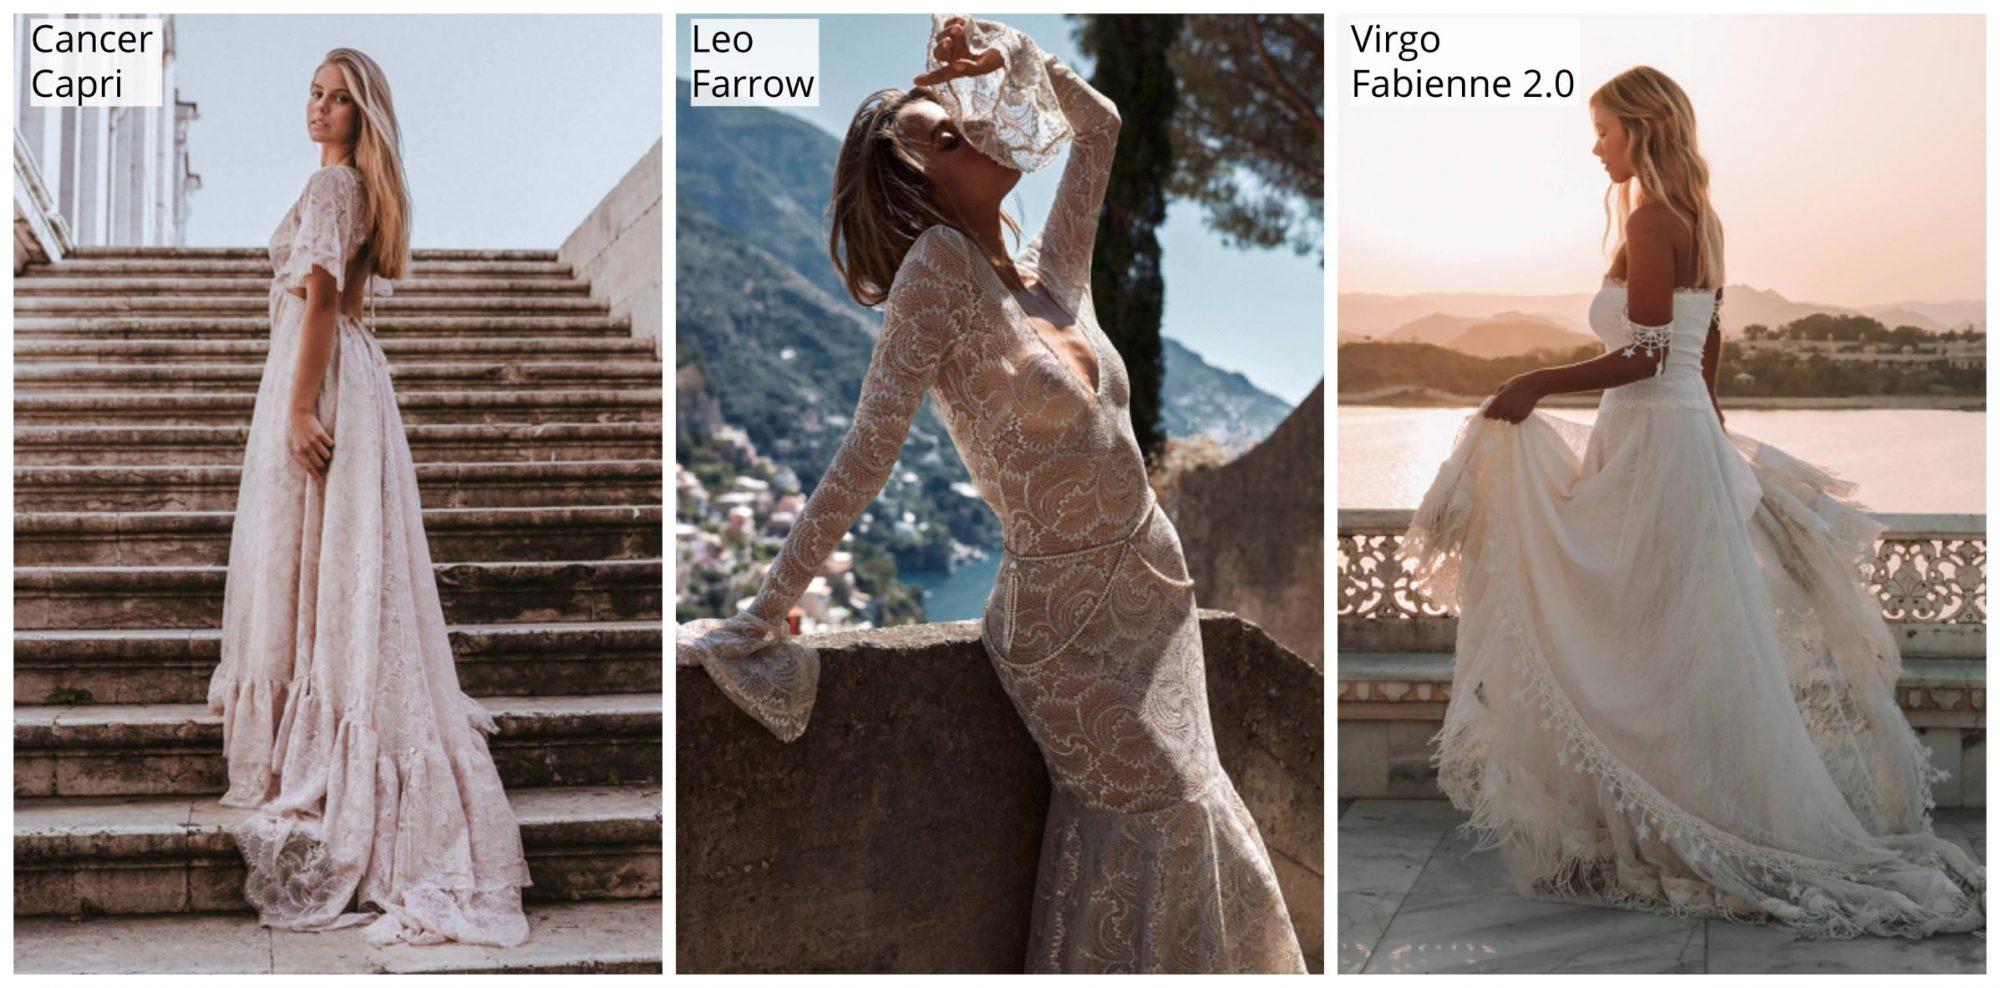 Dress for your zodiac: Cancer Leo Virgo